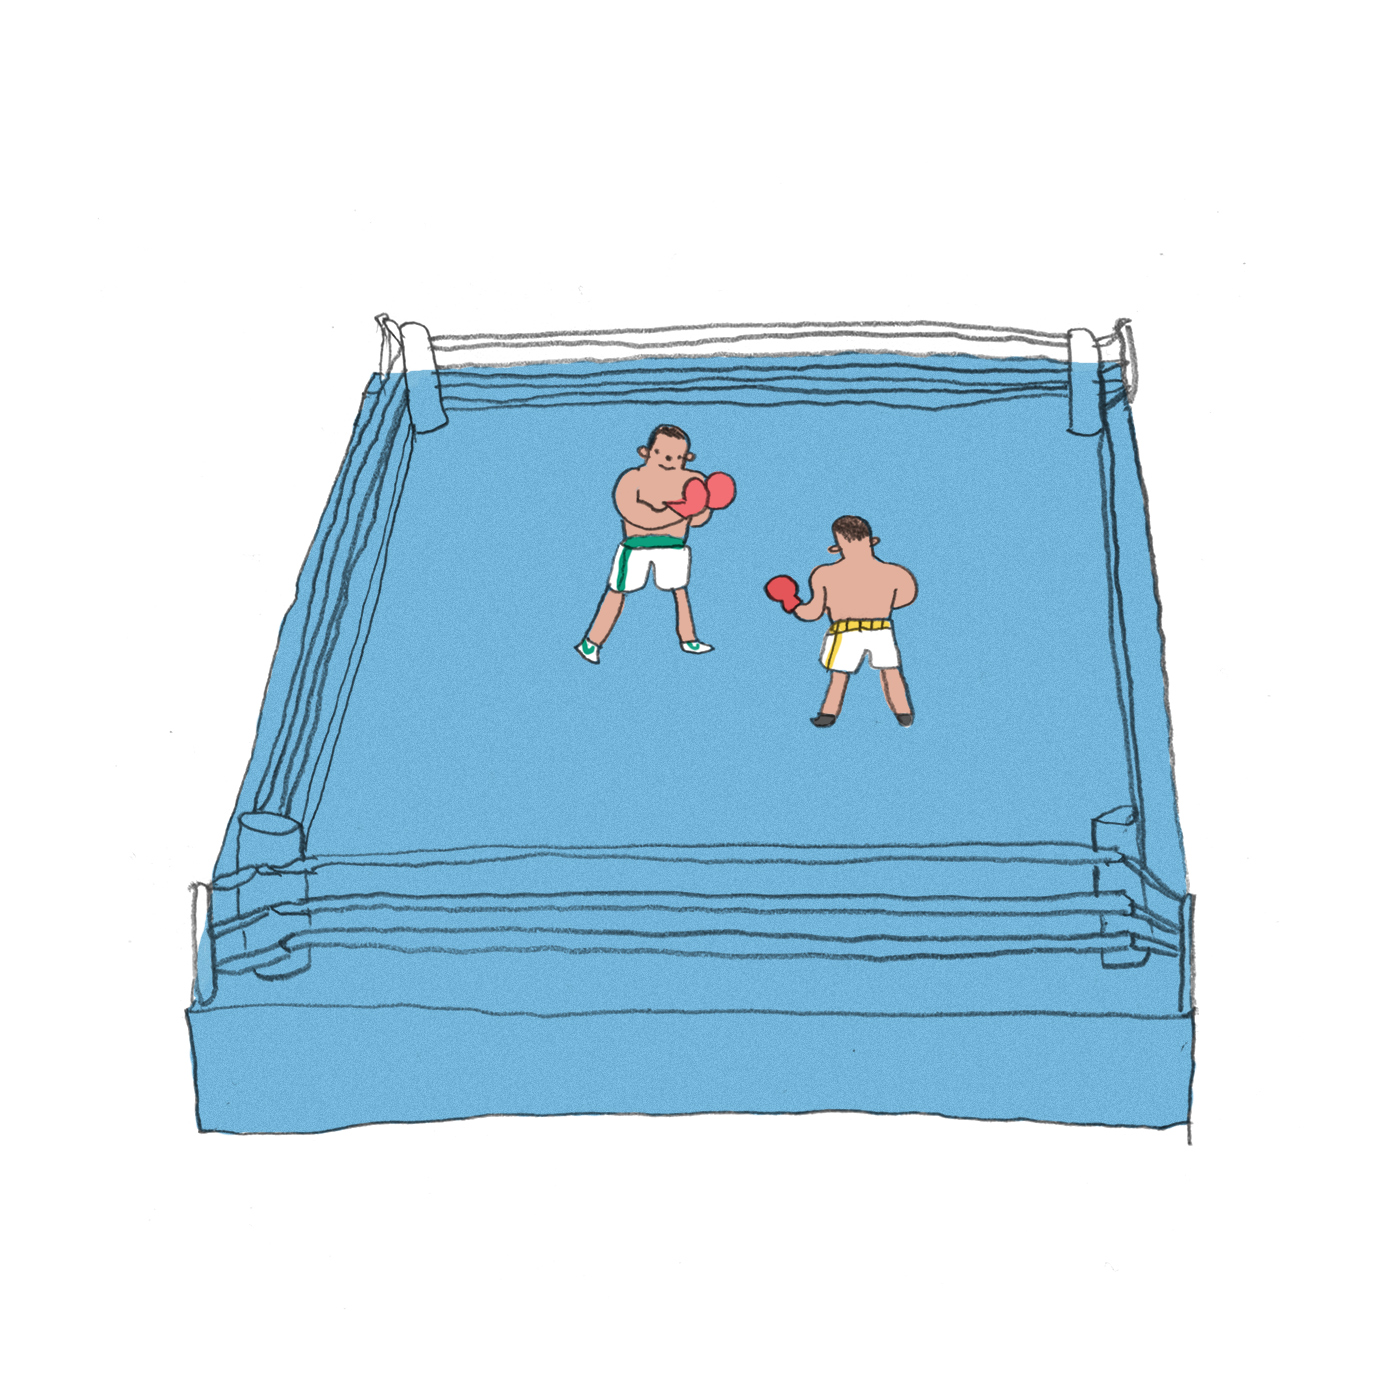 / Sports Illustration